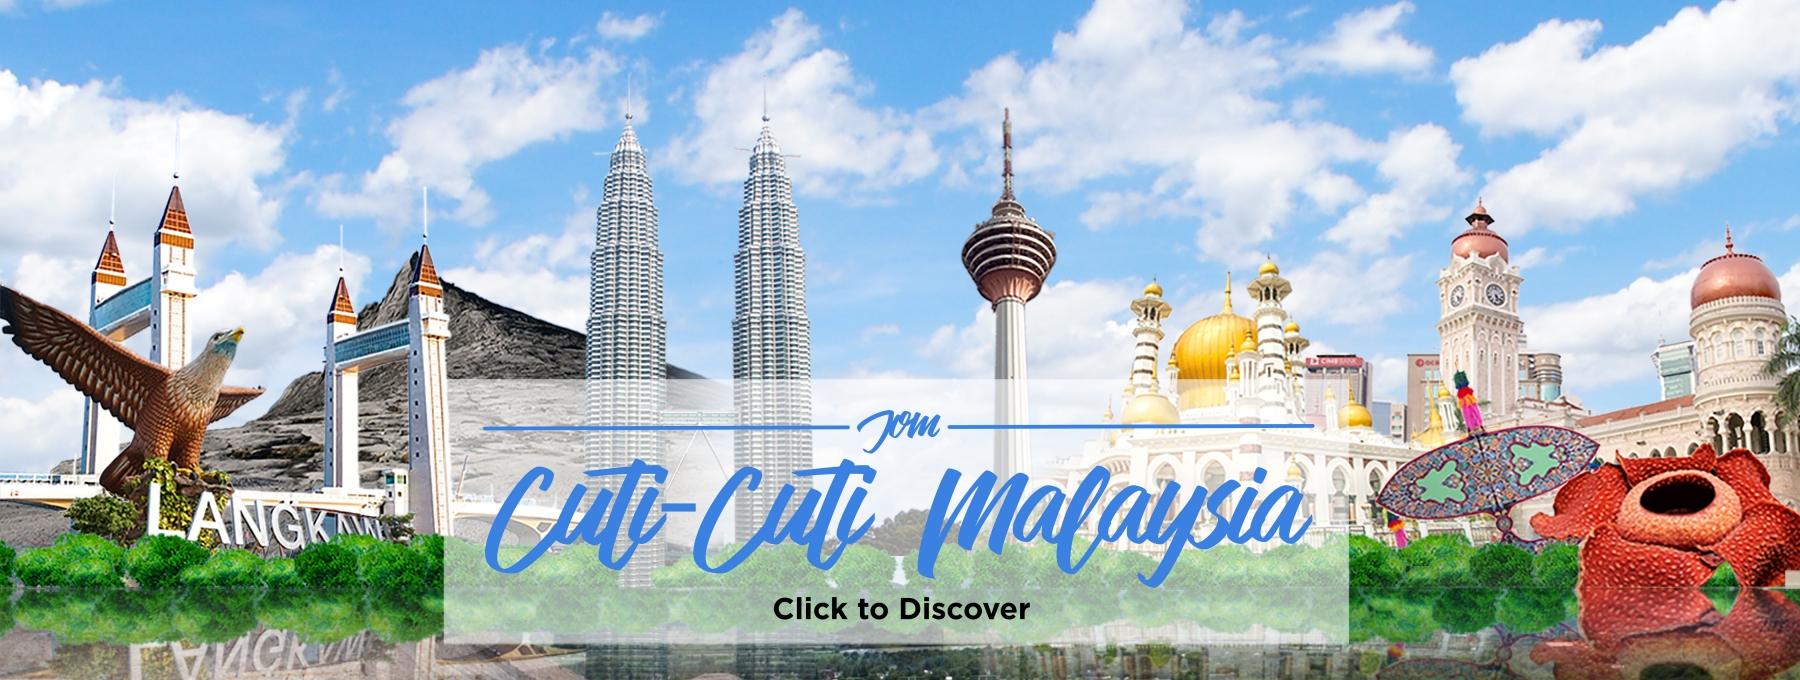 Jom Cuti-Cuti Malaysia Deals